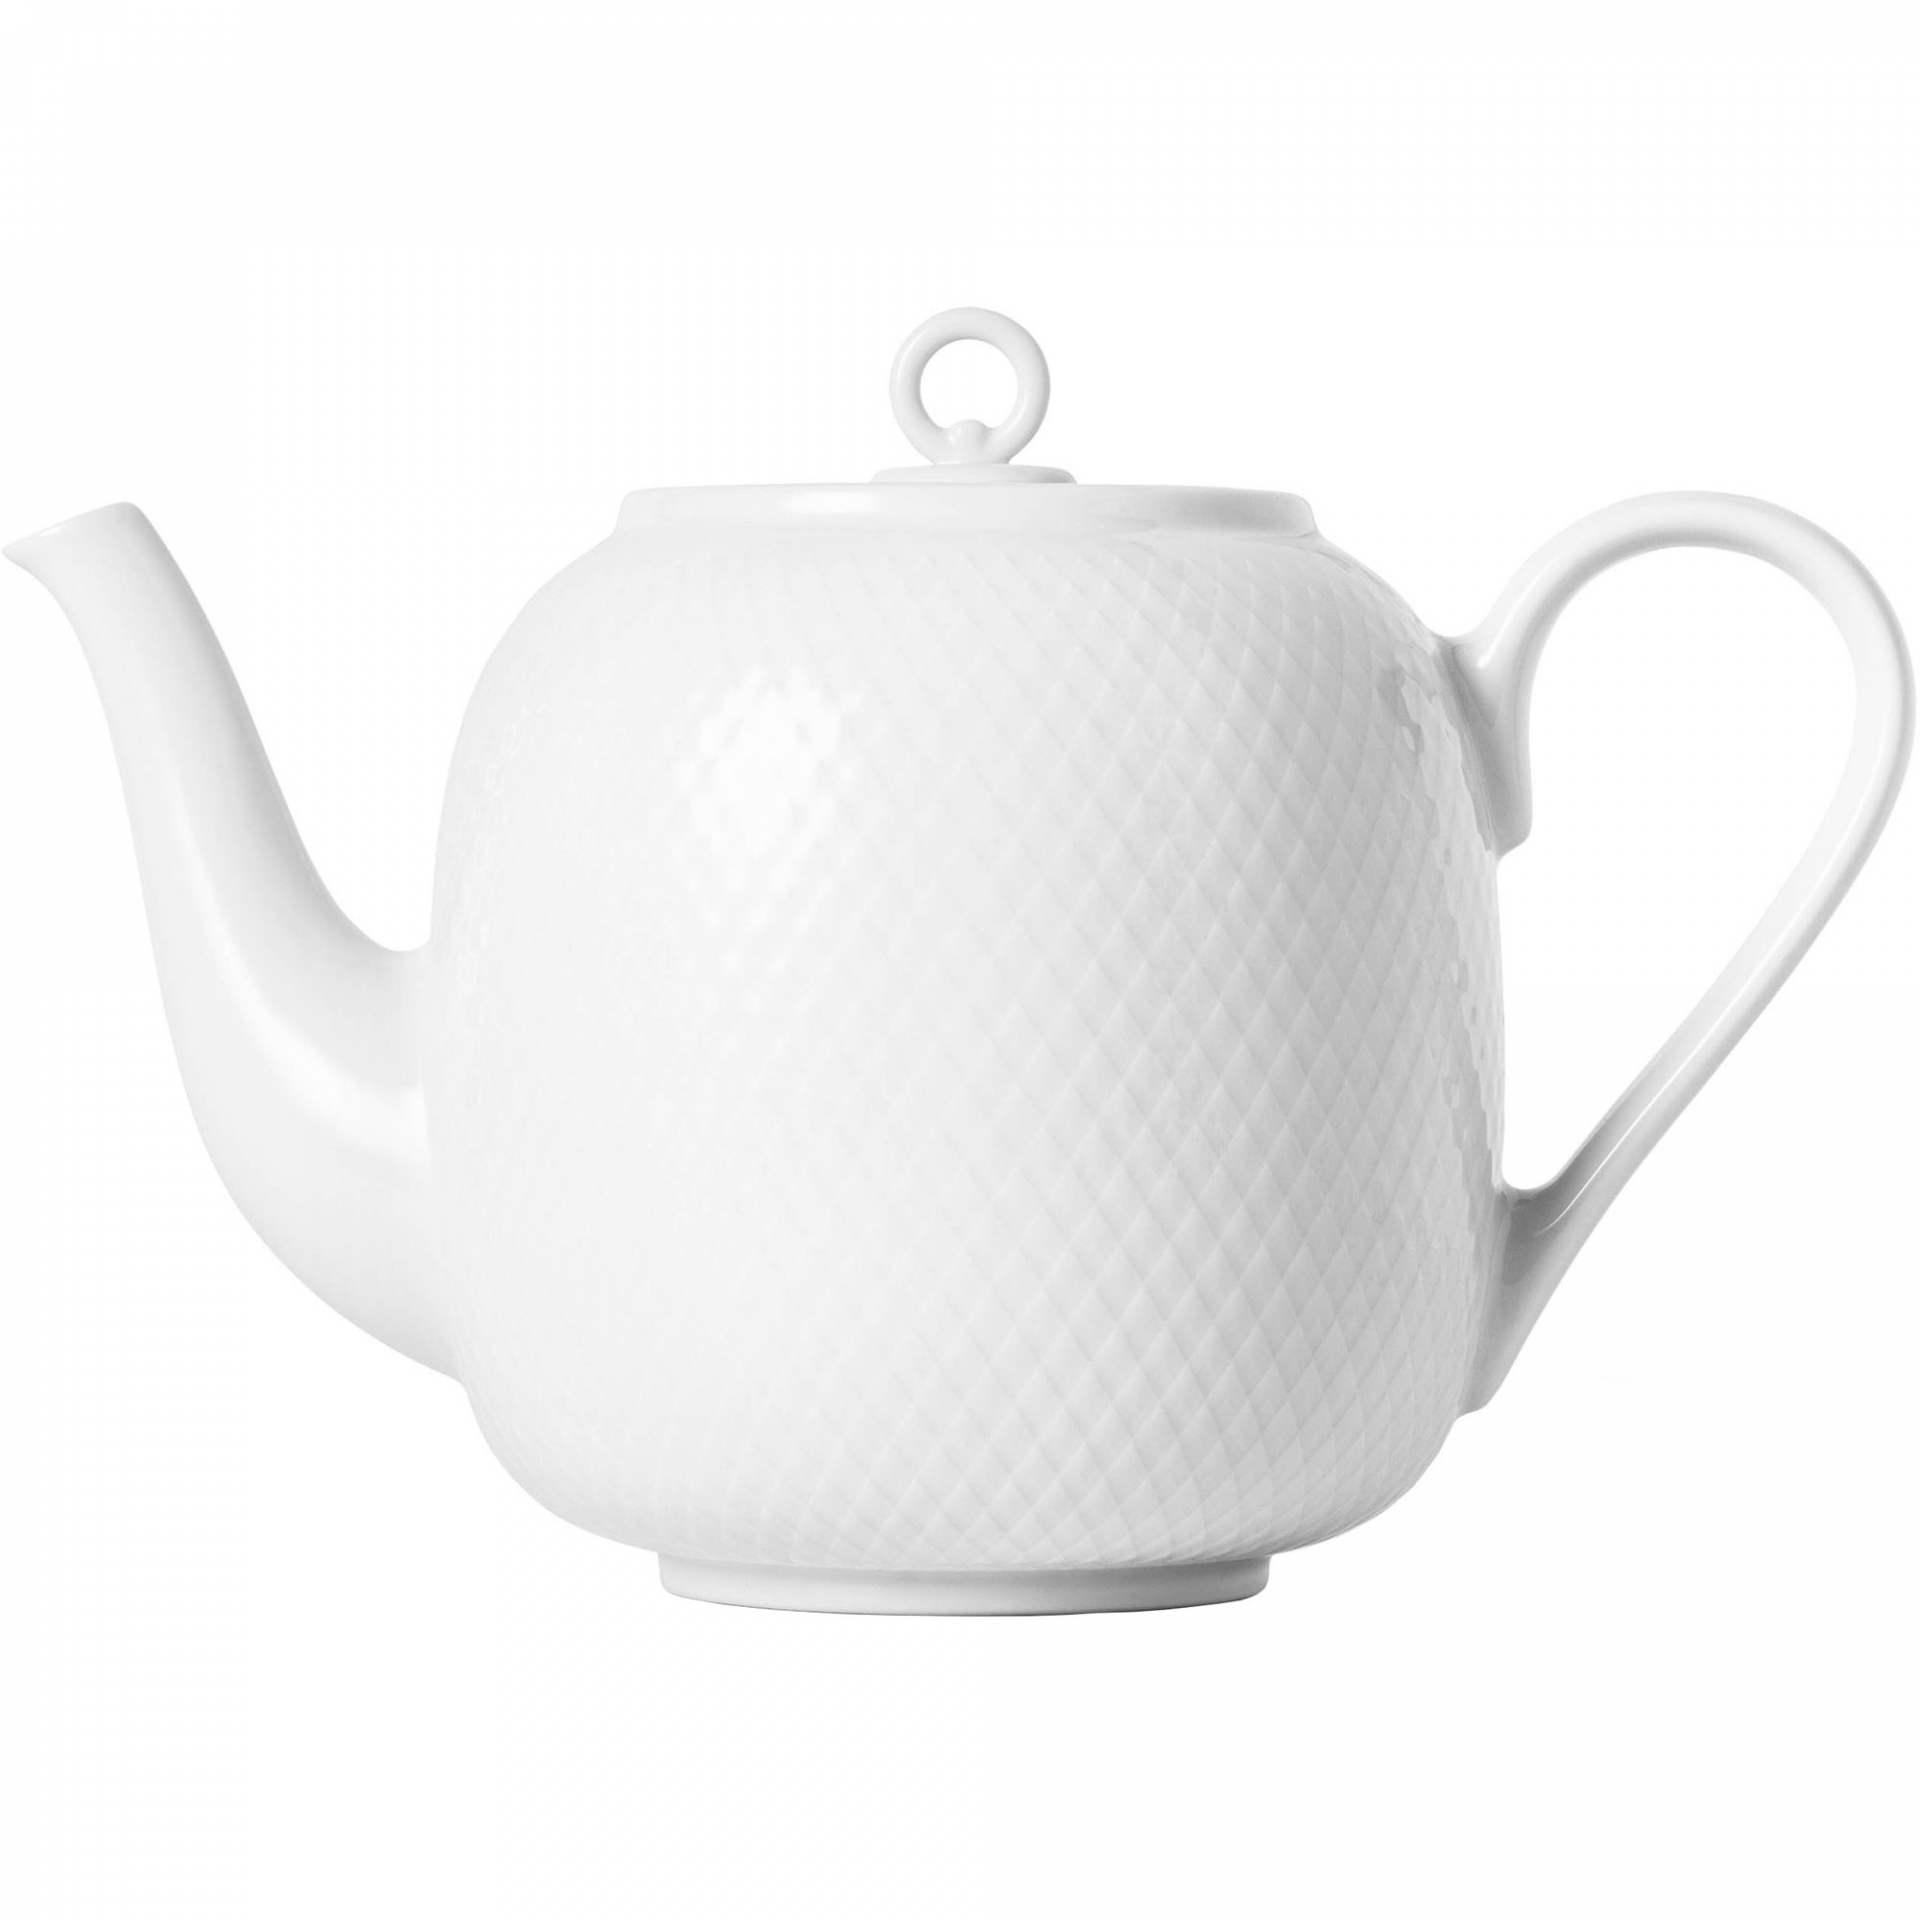 LYNGBY Porcelánová konvice Rhombe White 1,9 l, bílá barva, porcelán